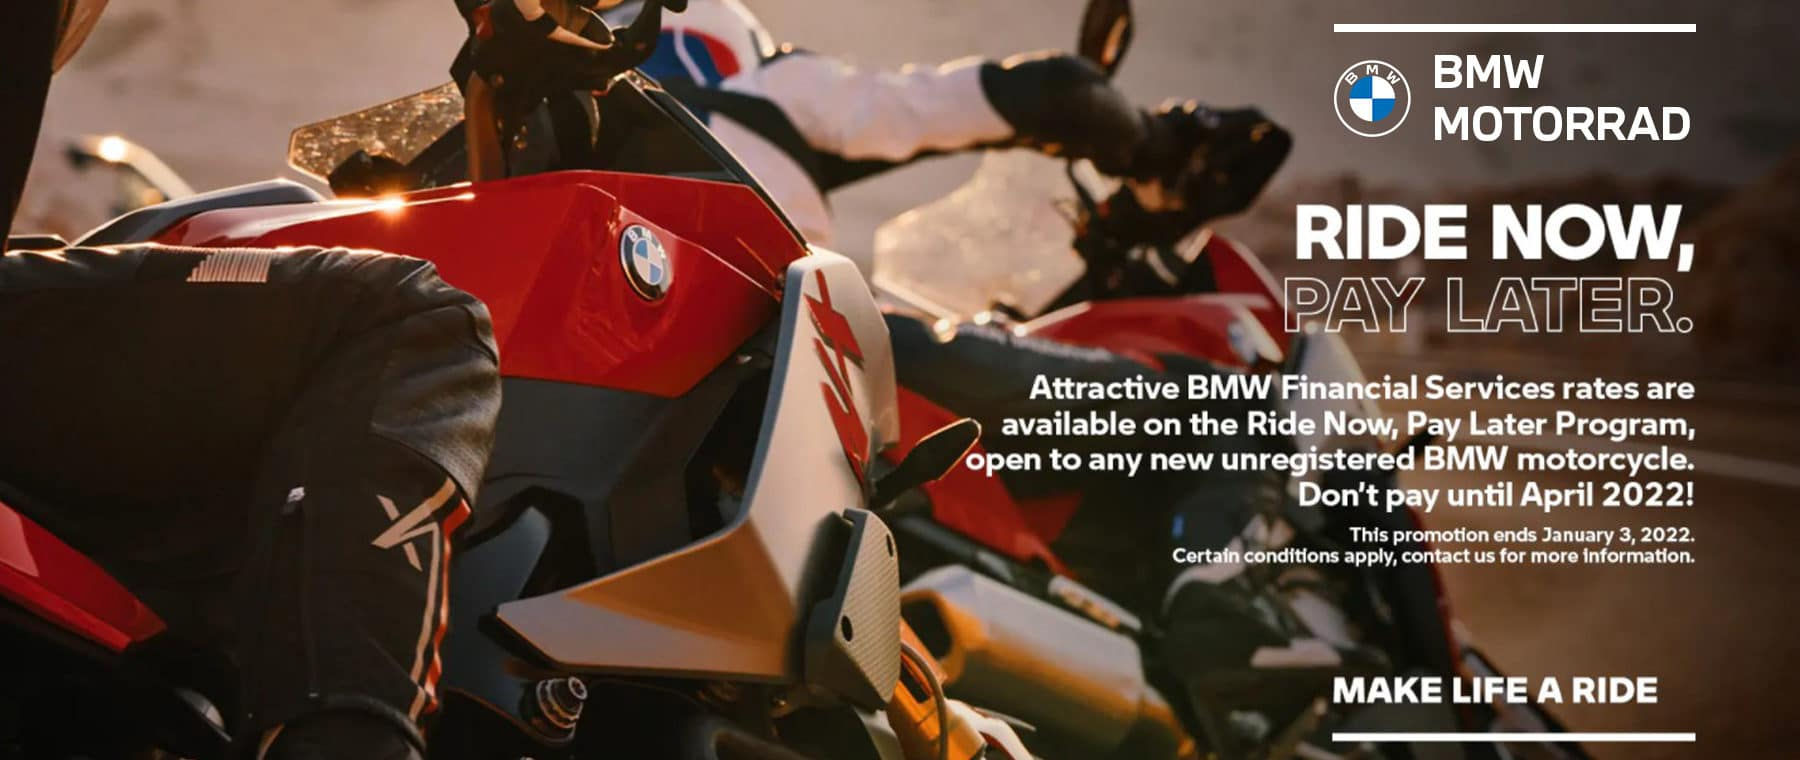 Moto_RideNow